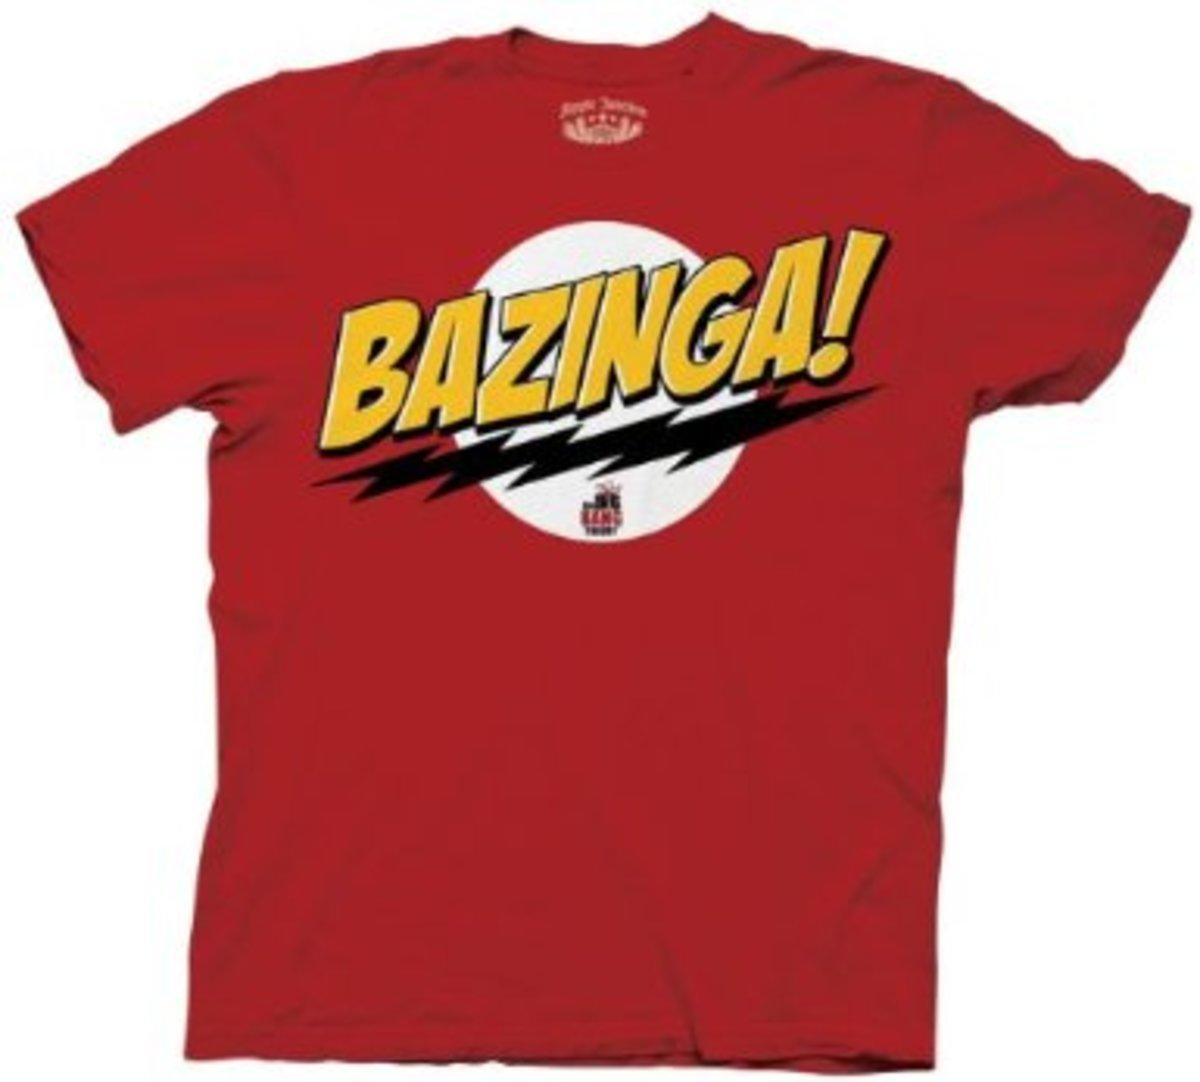 Sheldon Cooper's Bazinga T-Shirt